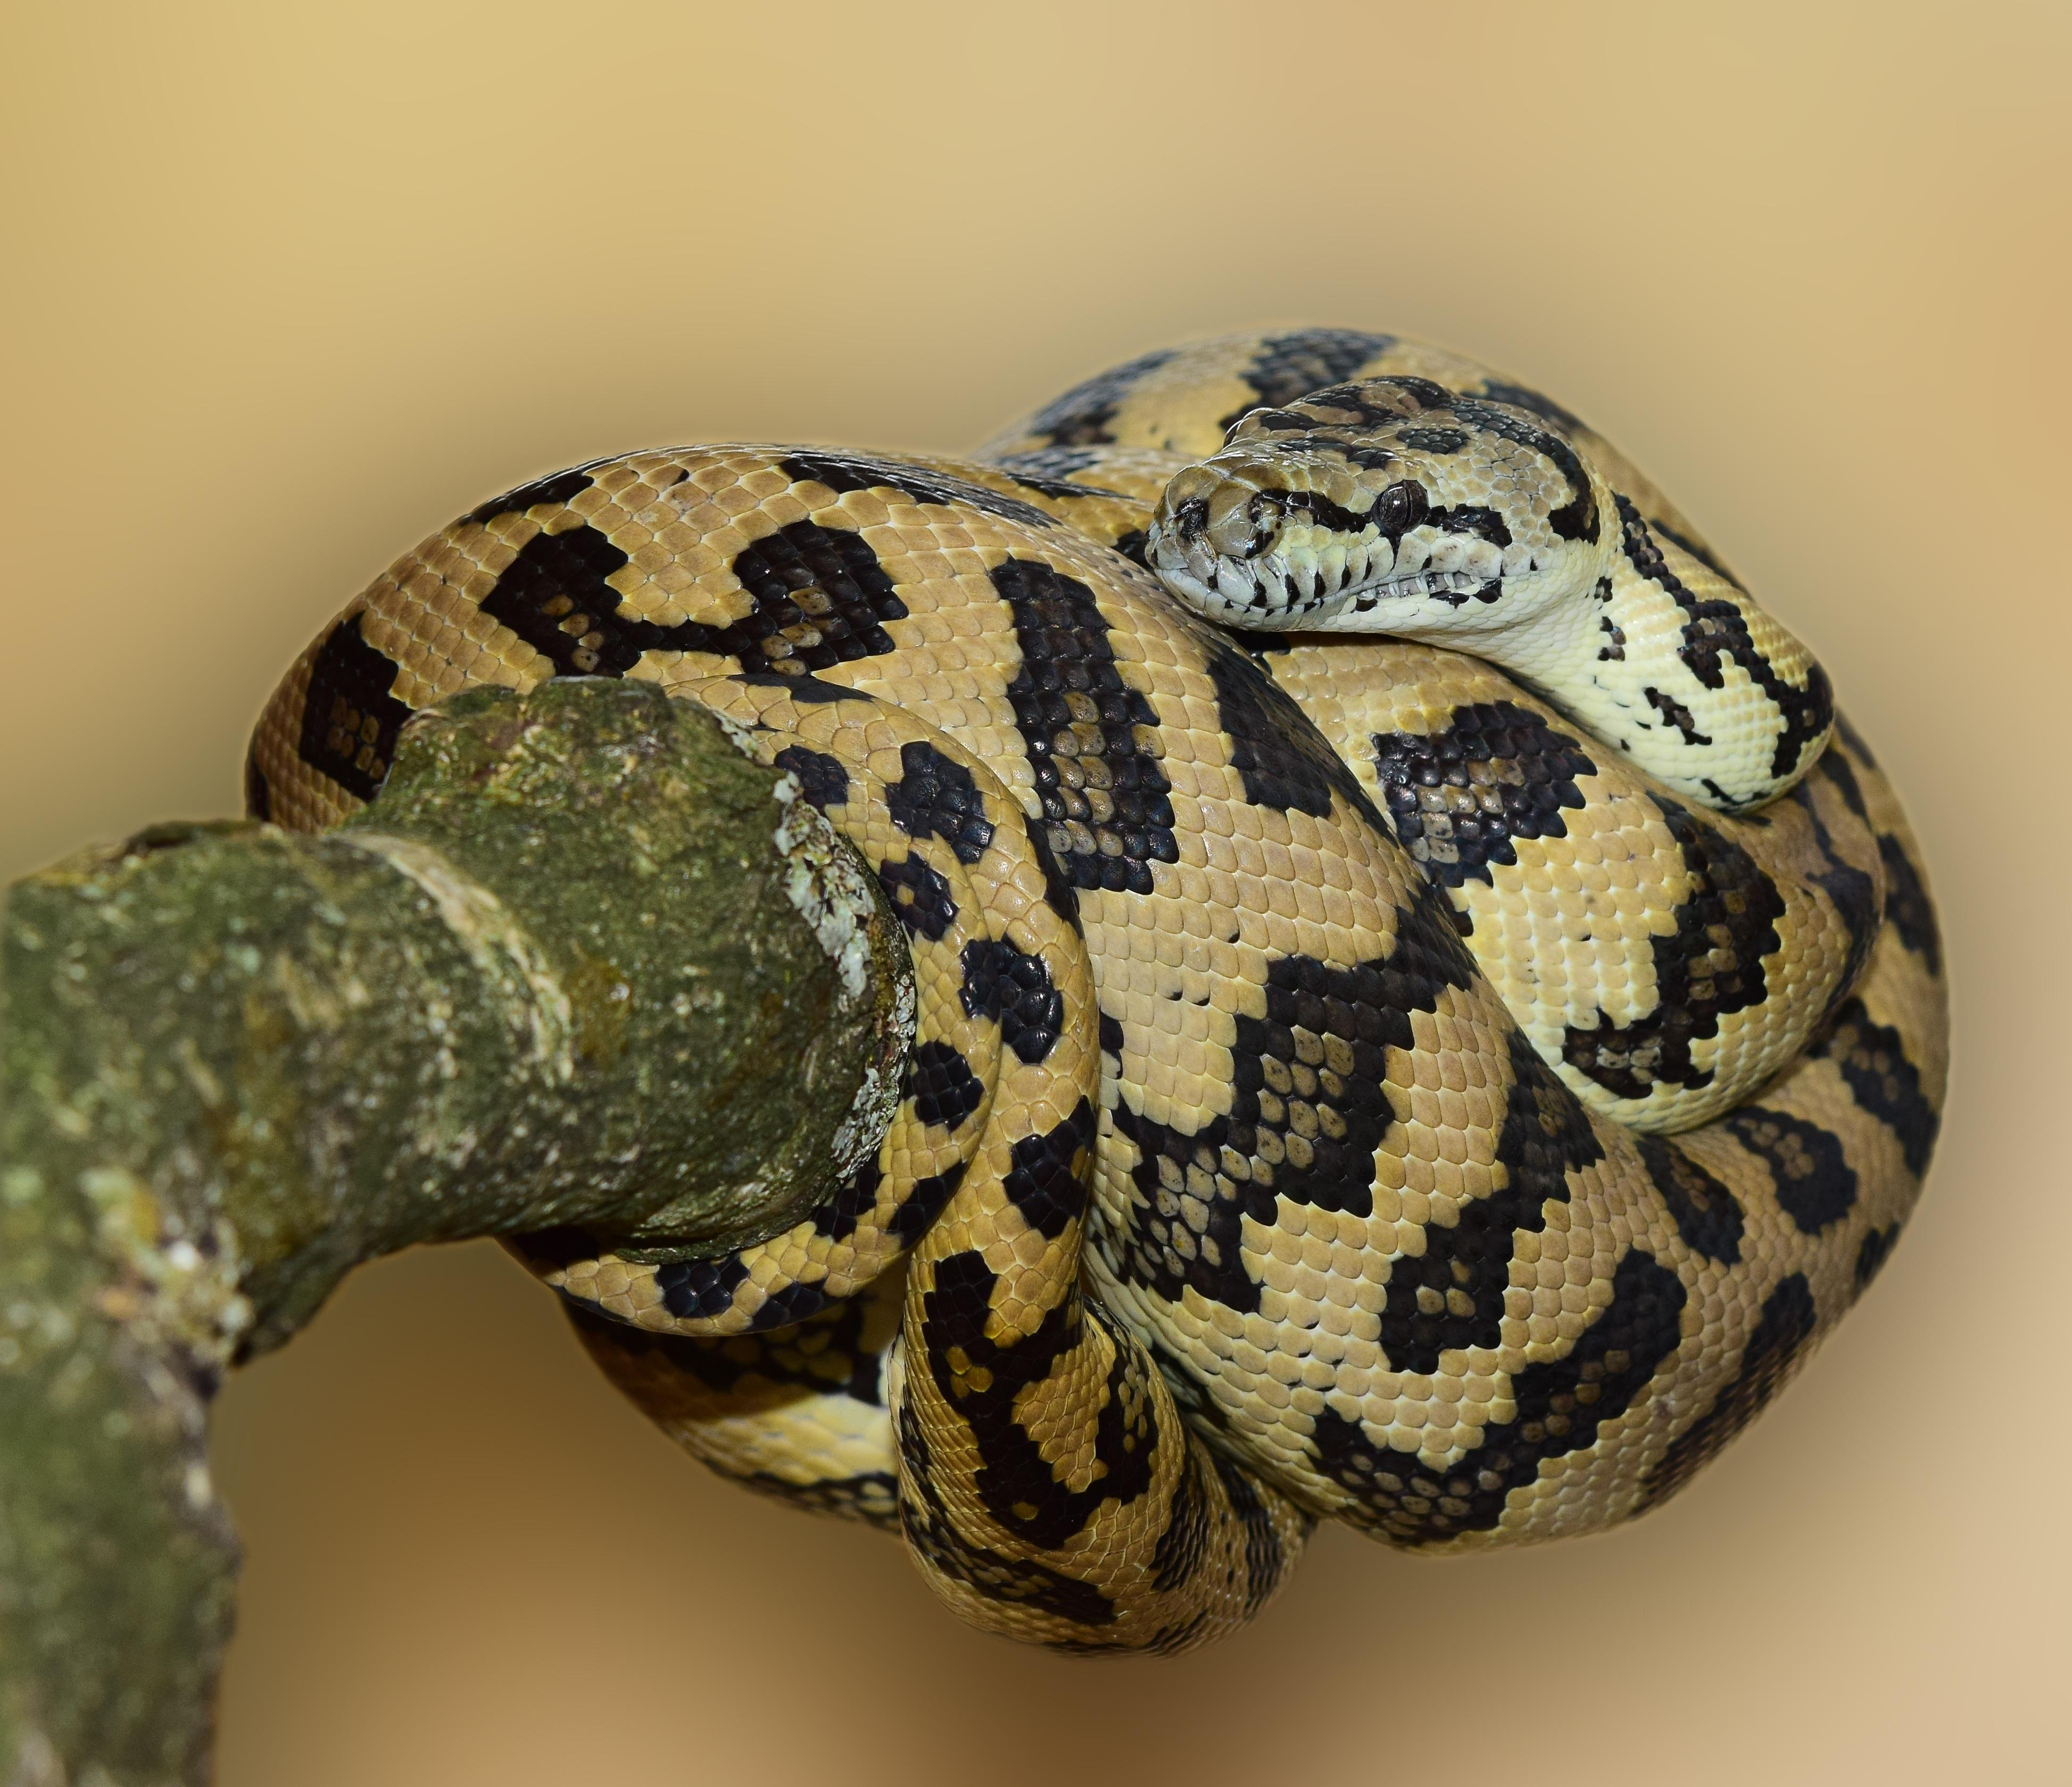 nature pattern reptile scale close australia eye snake vertebrate beautiful animal world serpent constrictor carpet python